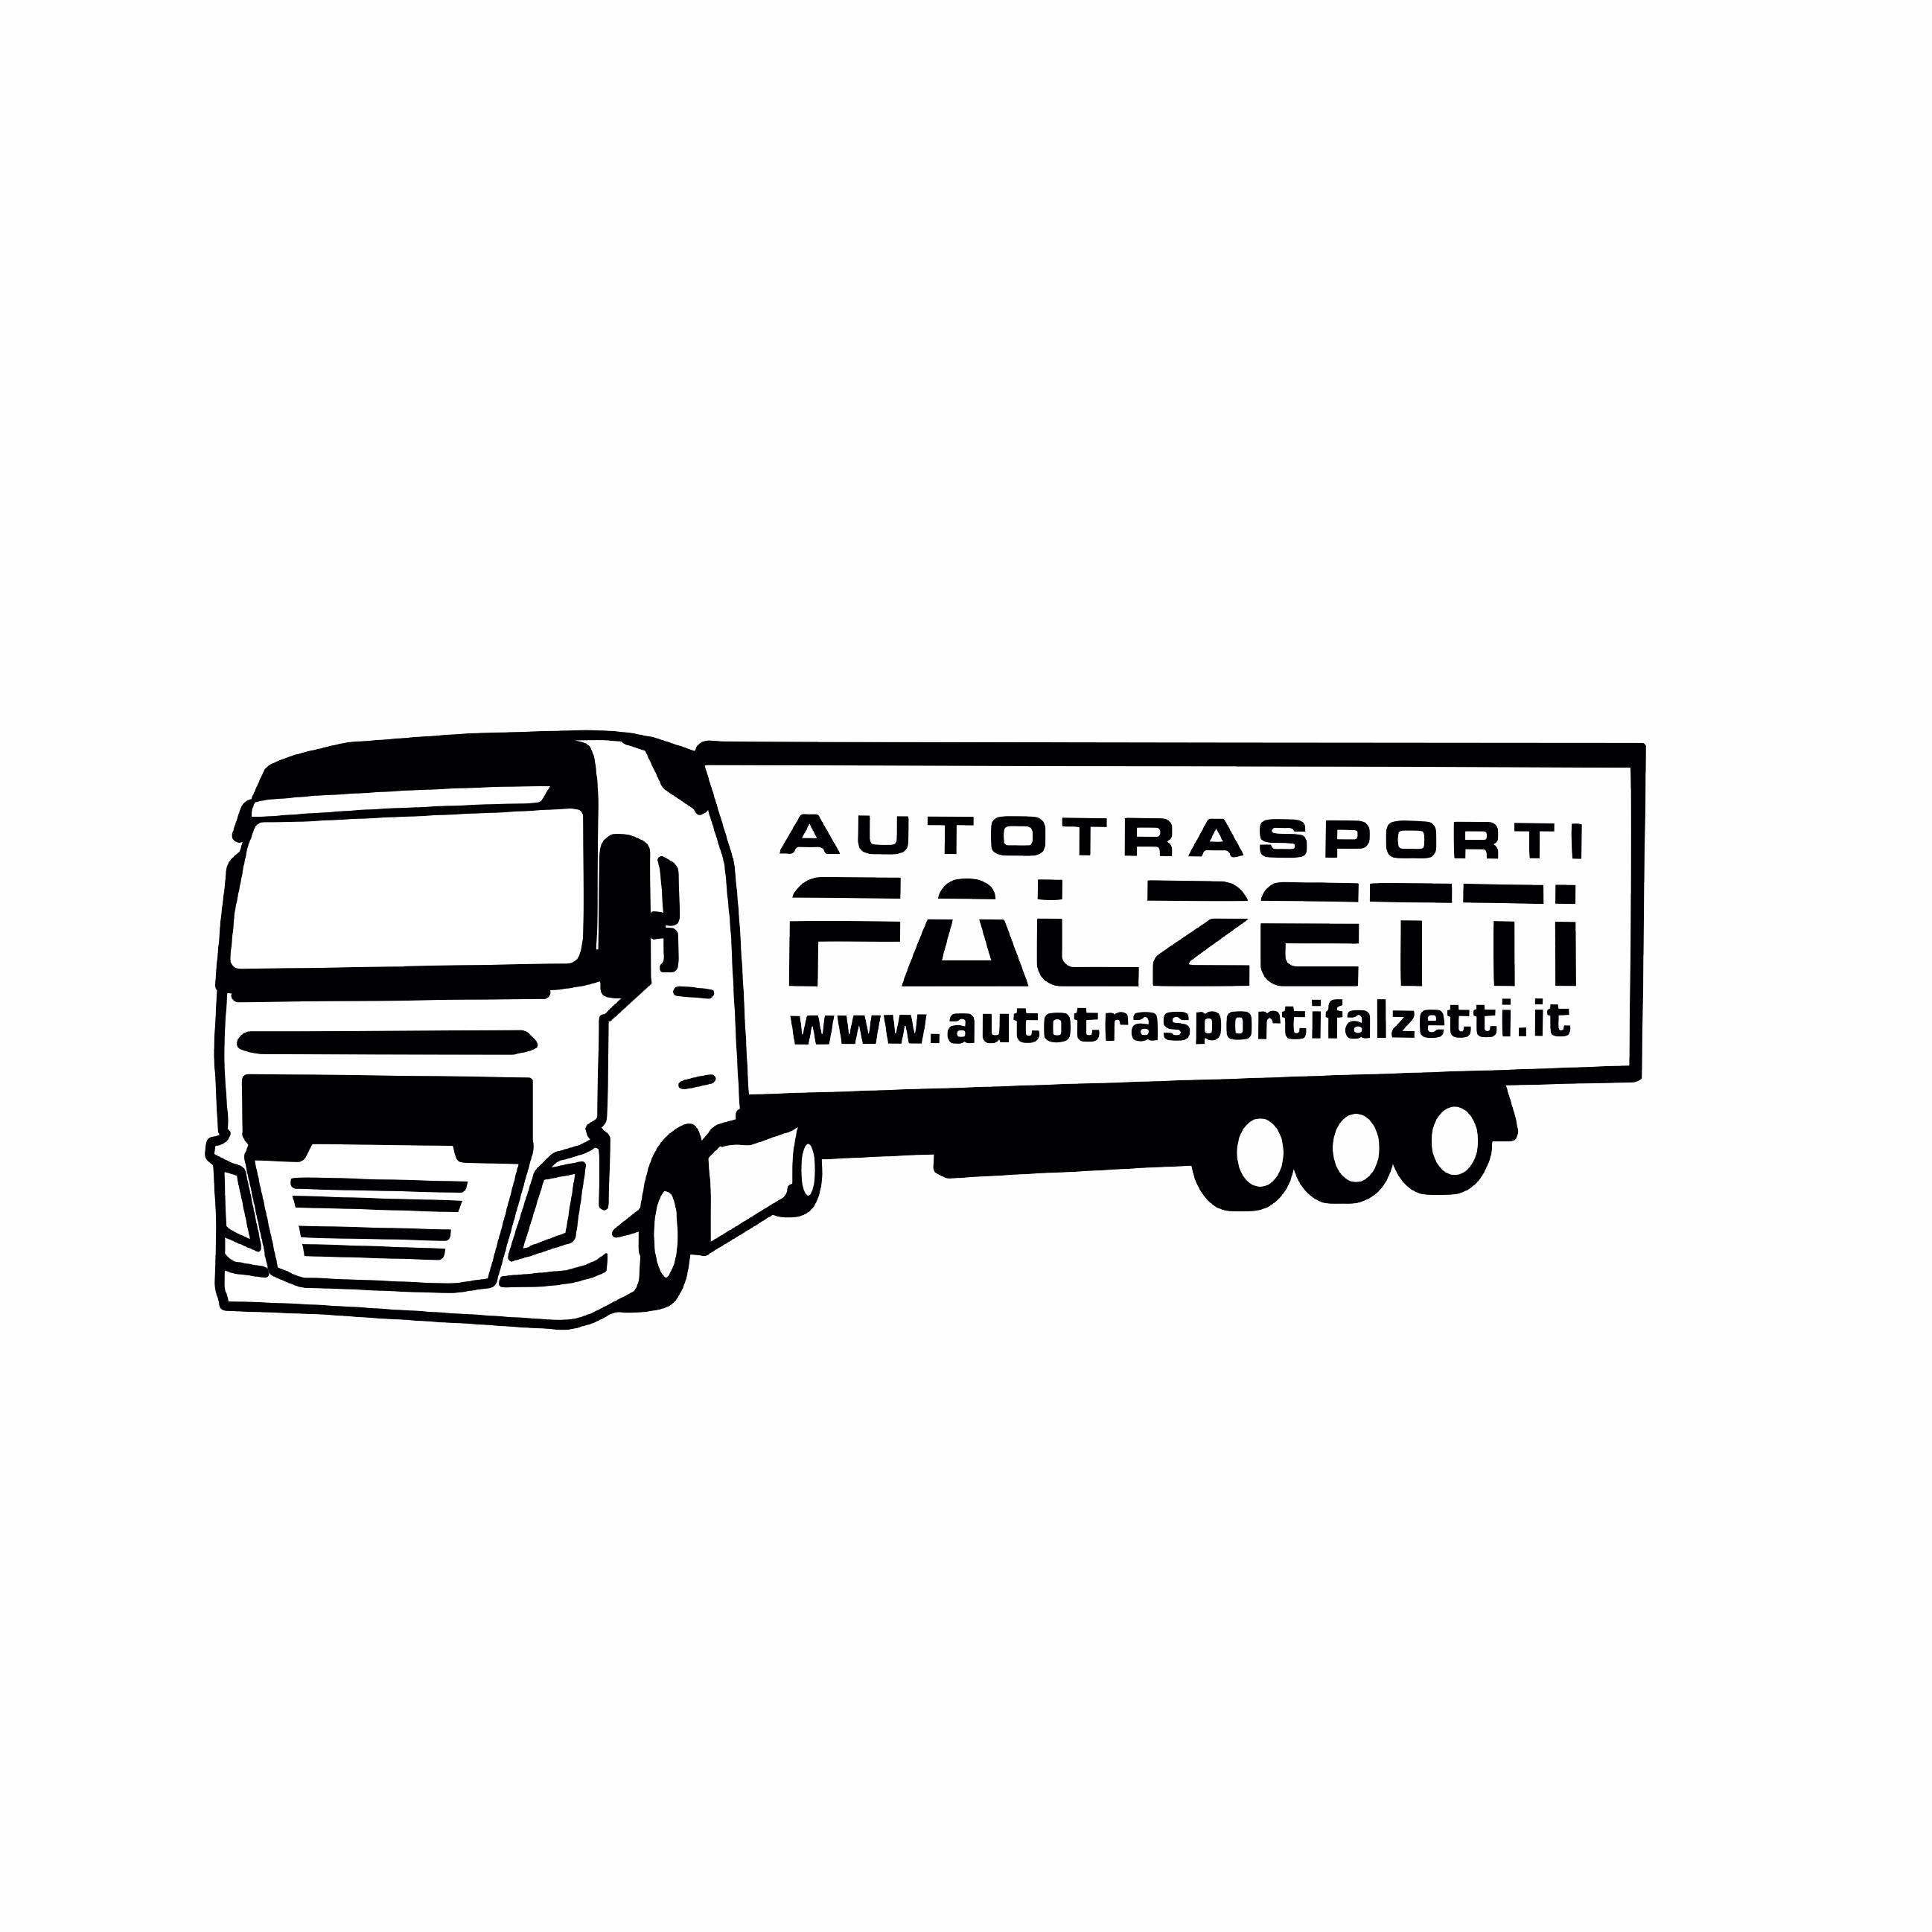 Logo Autotrasporti Falzetti srl - Cliente Citynet Srl